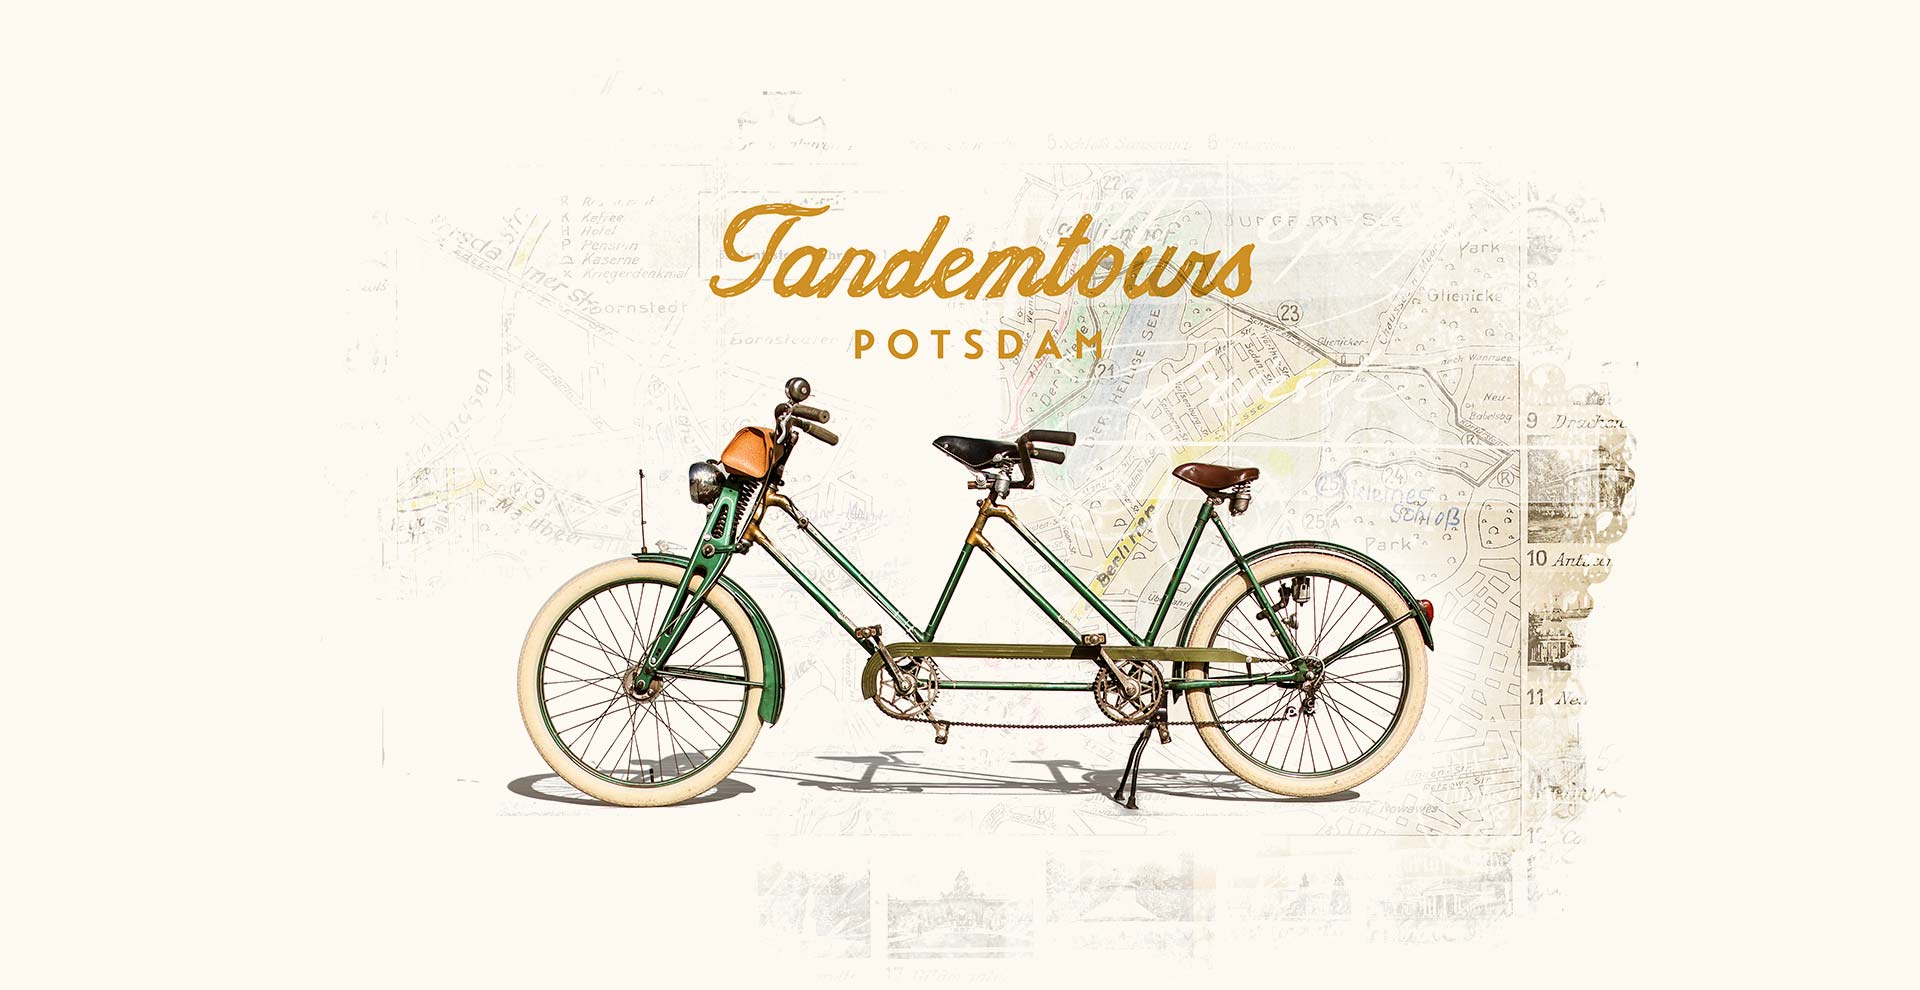 Tandemtours Potsdam